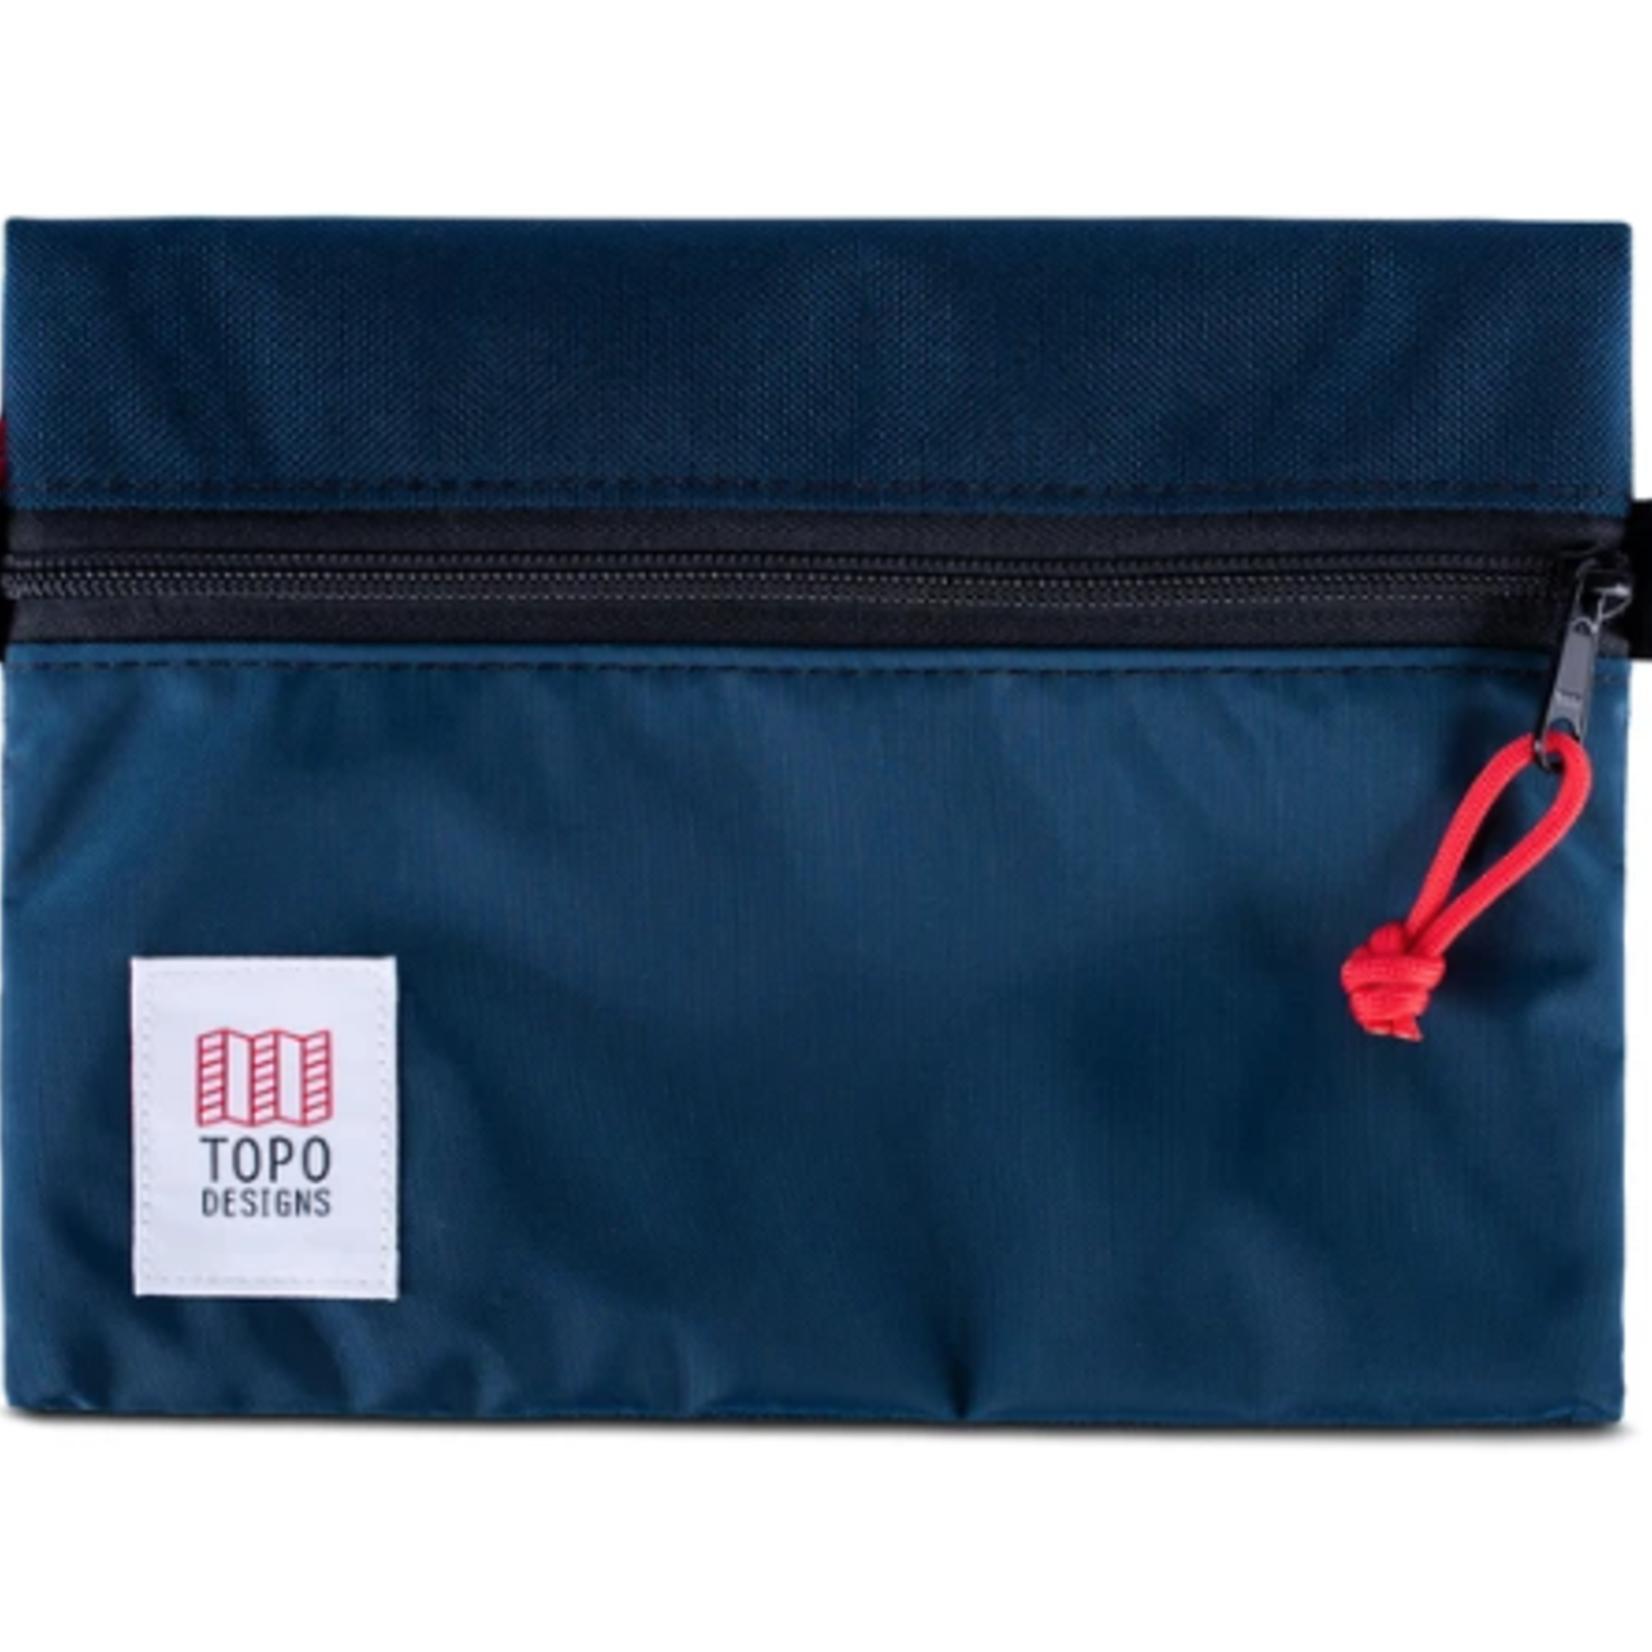 Topo Designs Topo Designs Accessory Bag - Medium, Navy